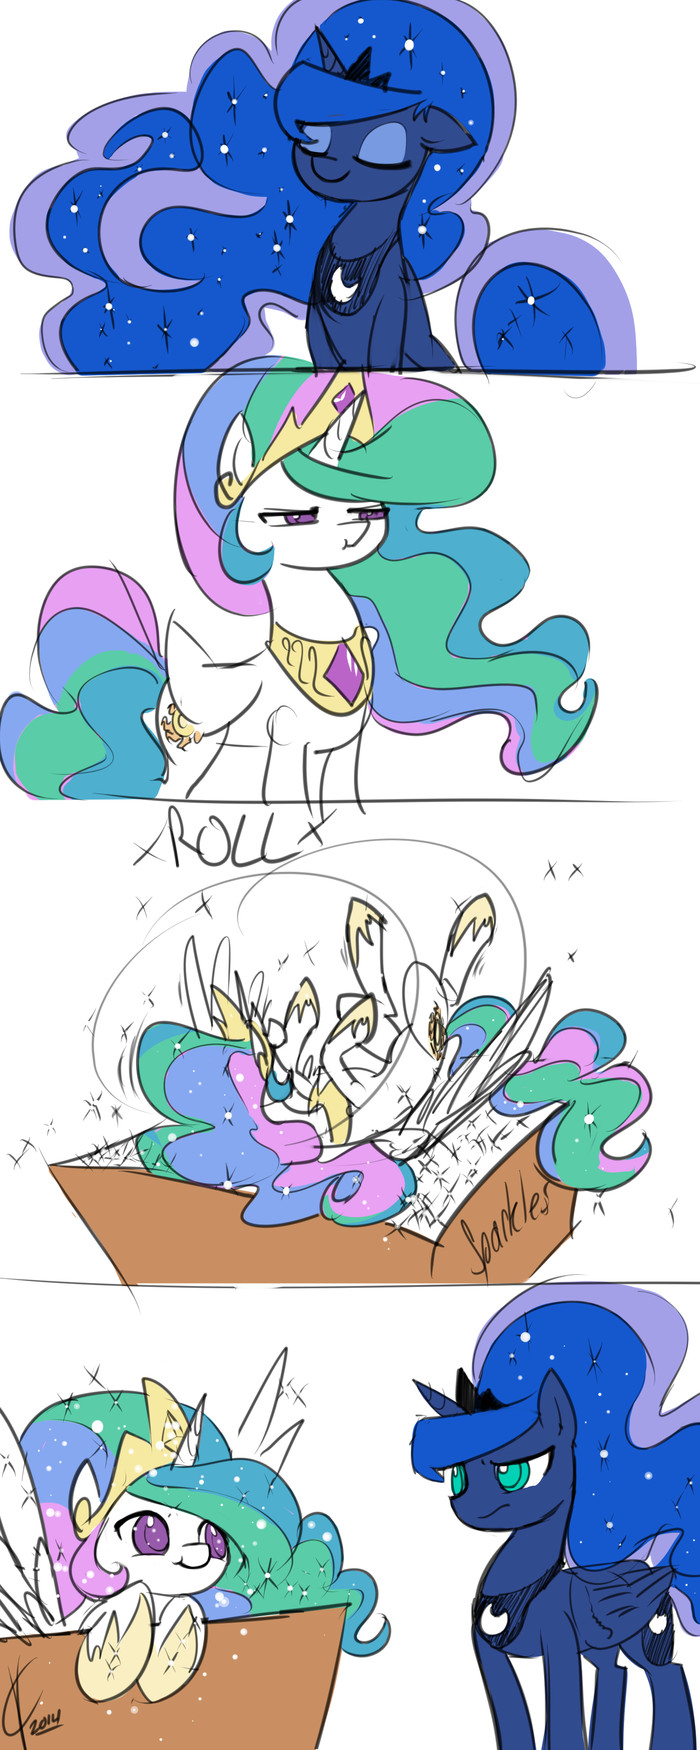 Hair Sparkles My Little Pony, Комиксы, Princess Celestia, Princess Luna, Блестки, Valcron, Длиннопост